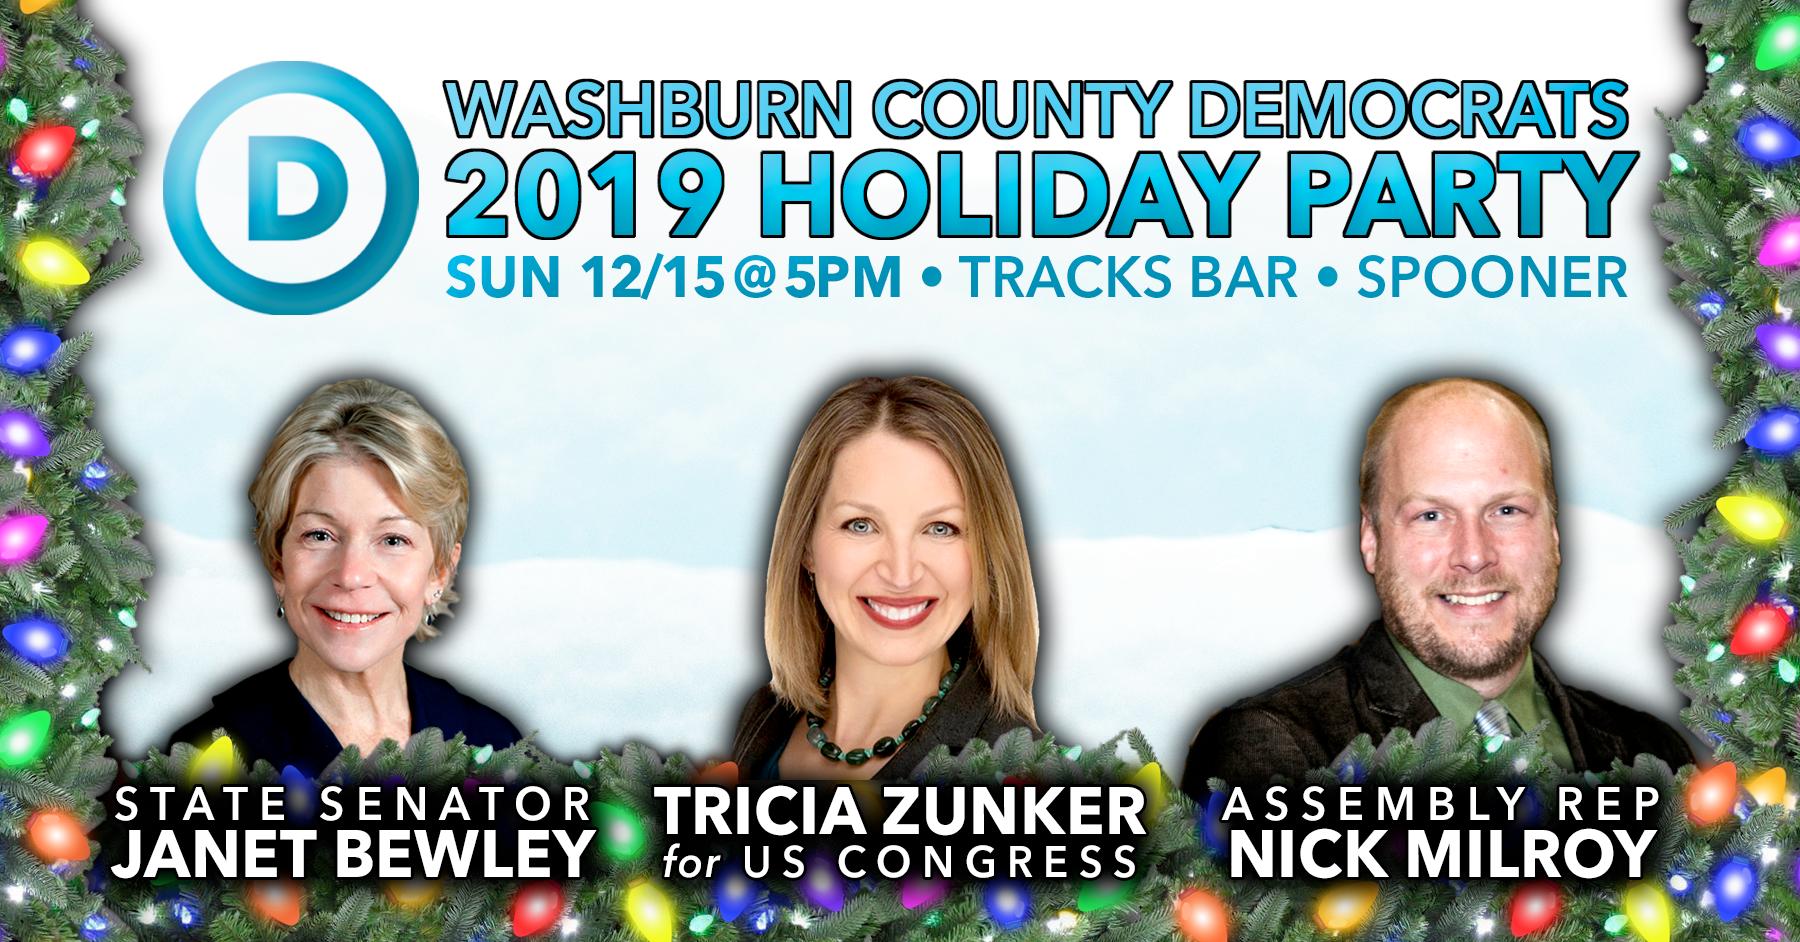 Washburn County Democratic Party (WI)